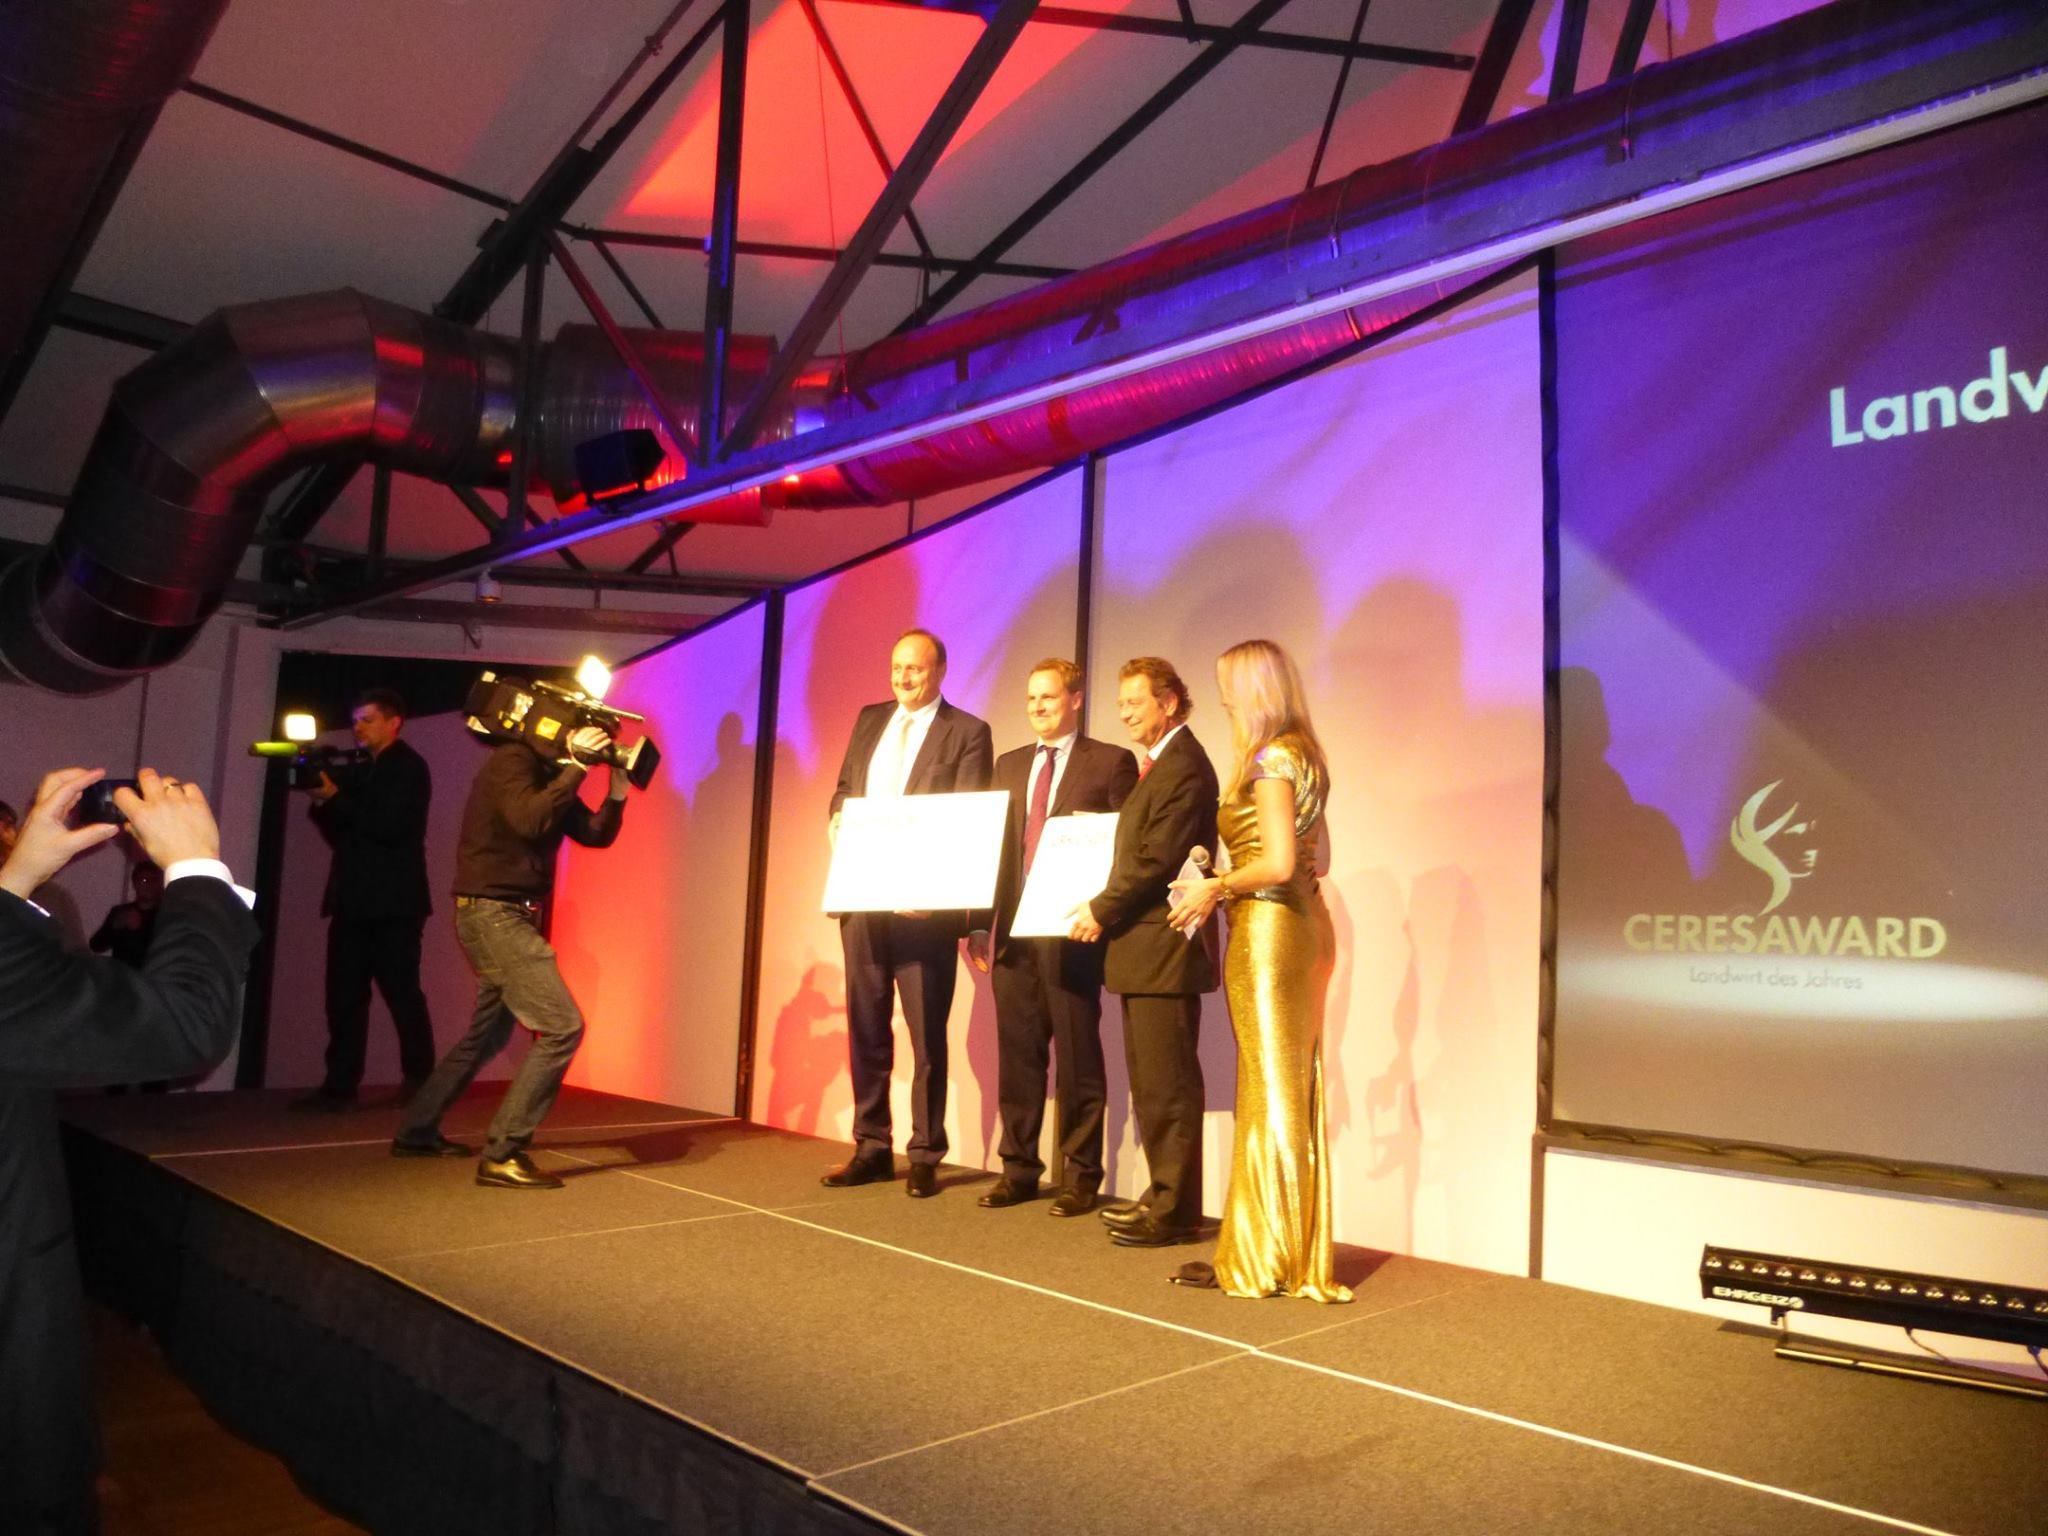 2014 erhielt Hauke den Ceres Award